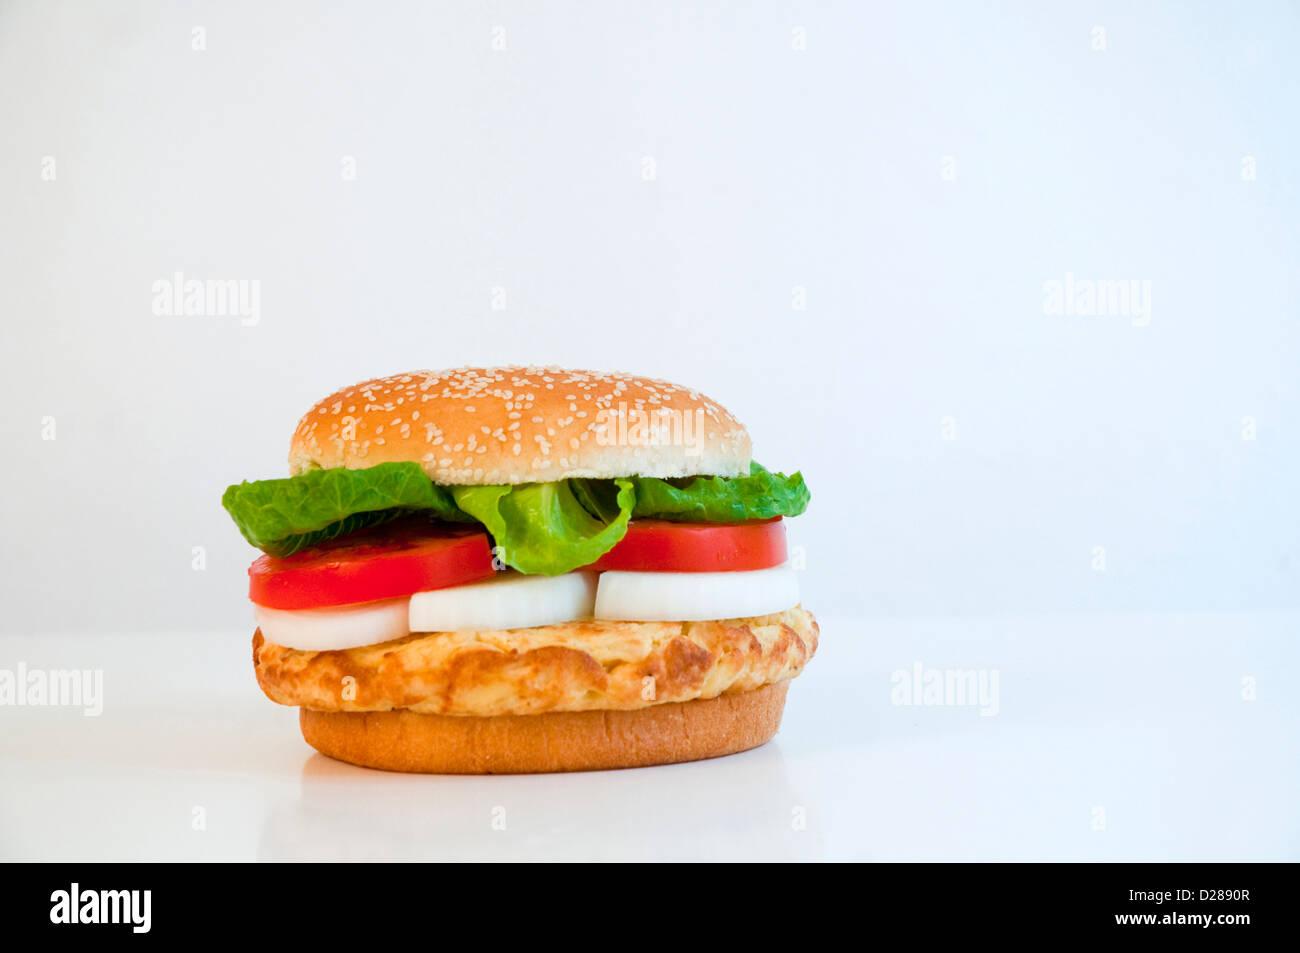 Spanish omelet as a hamburger. - Stock Image